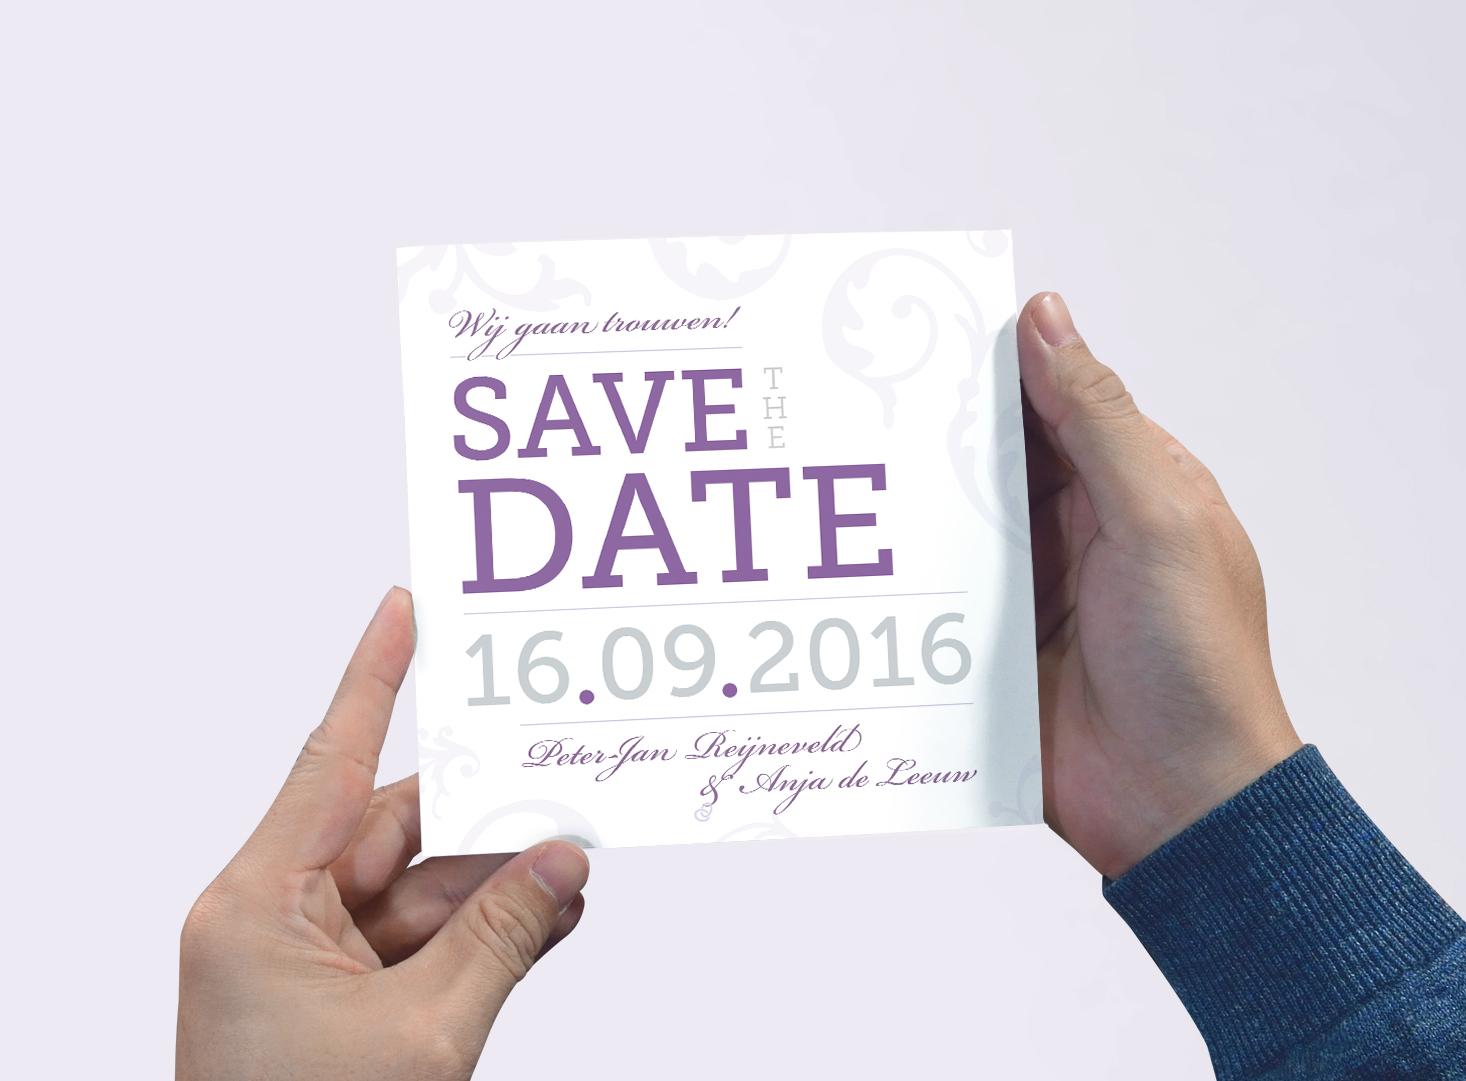 Trouwdag PJ&A - Save the Date kaart